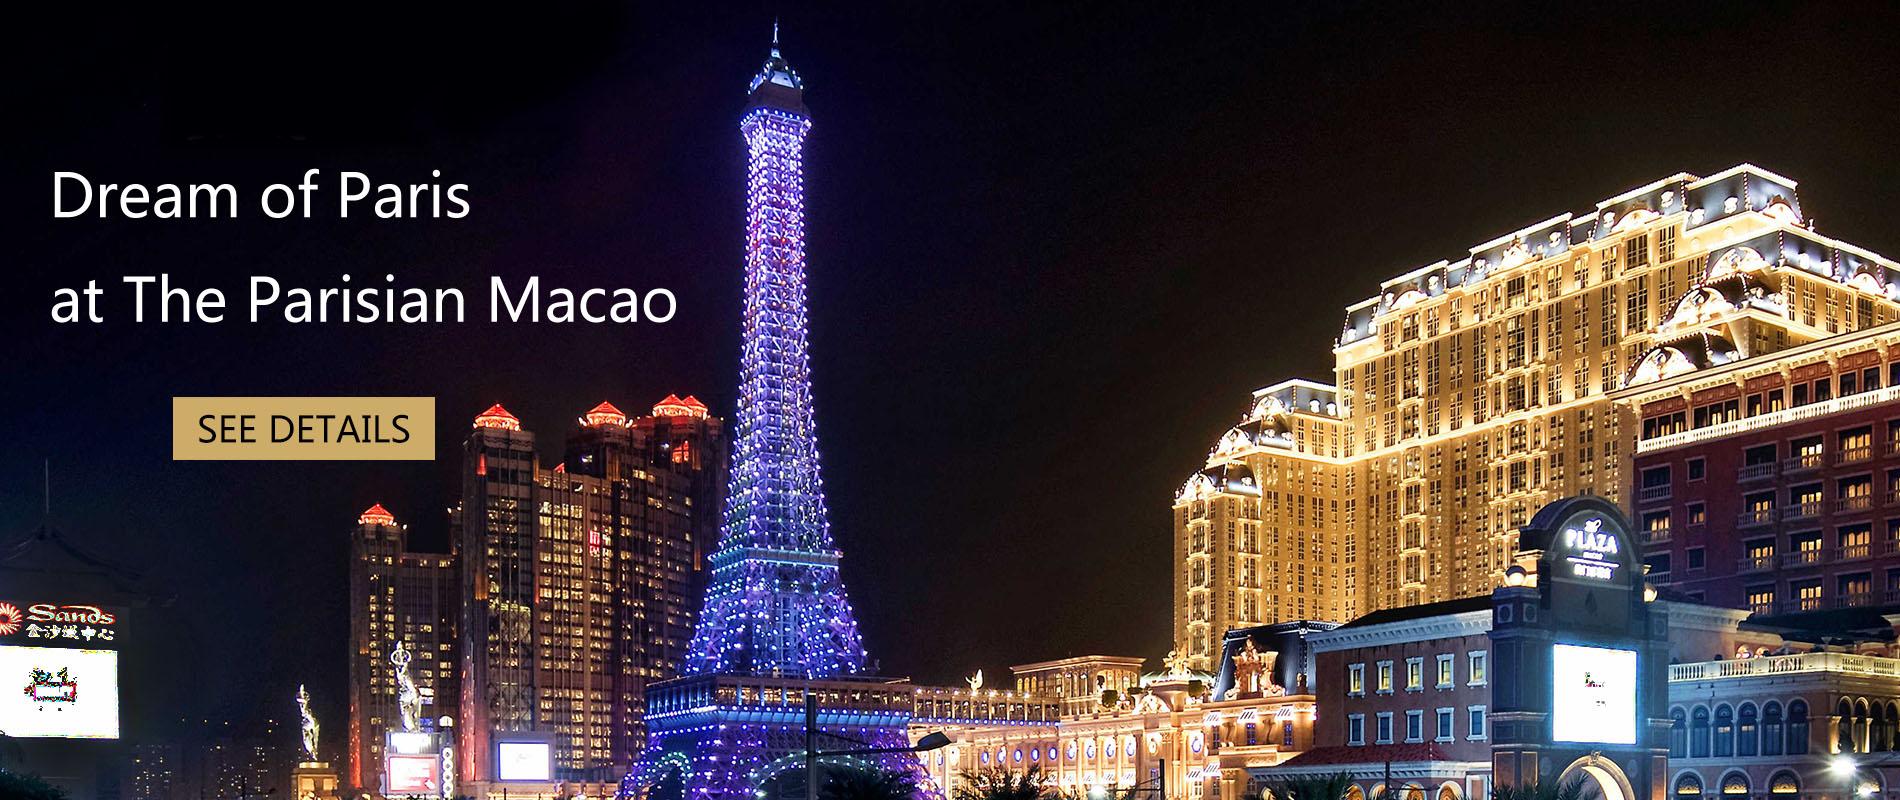 Dream of Paris at The Parisian Macao